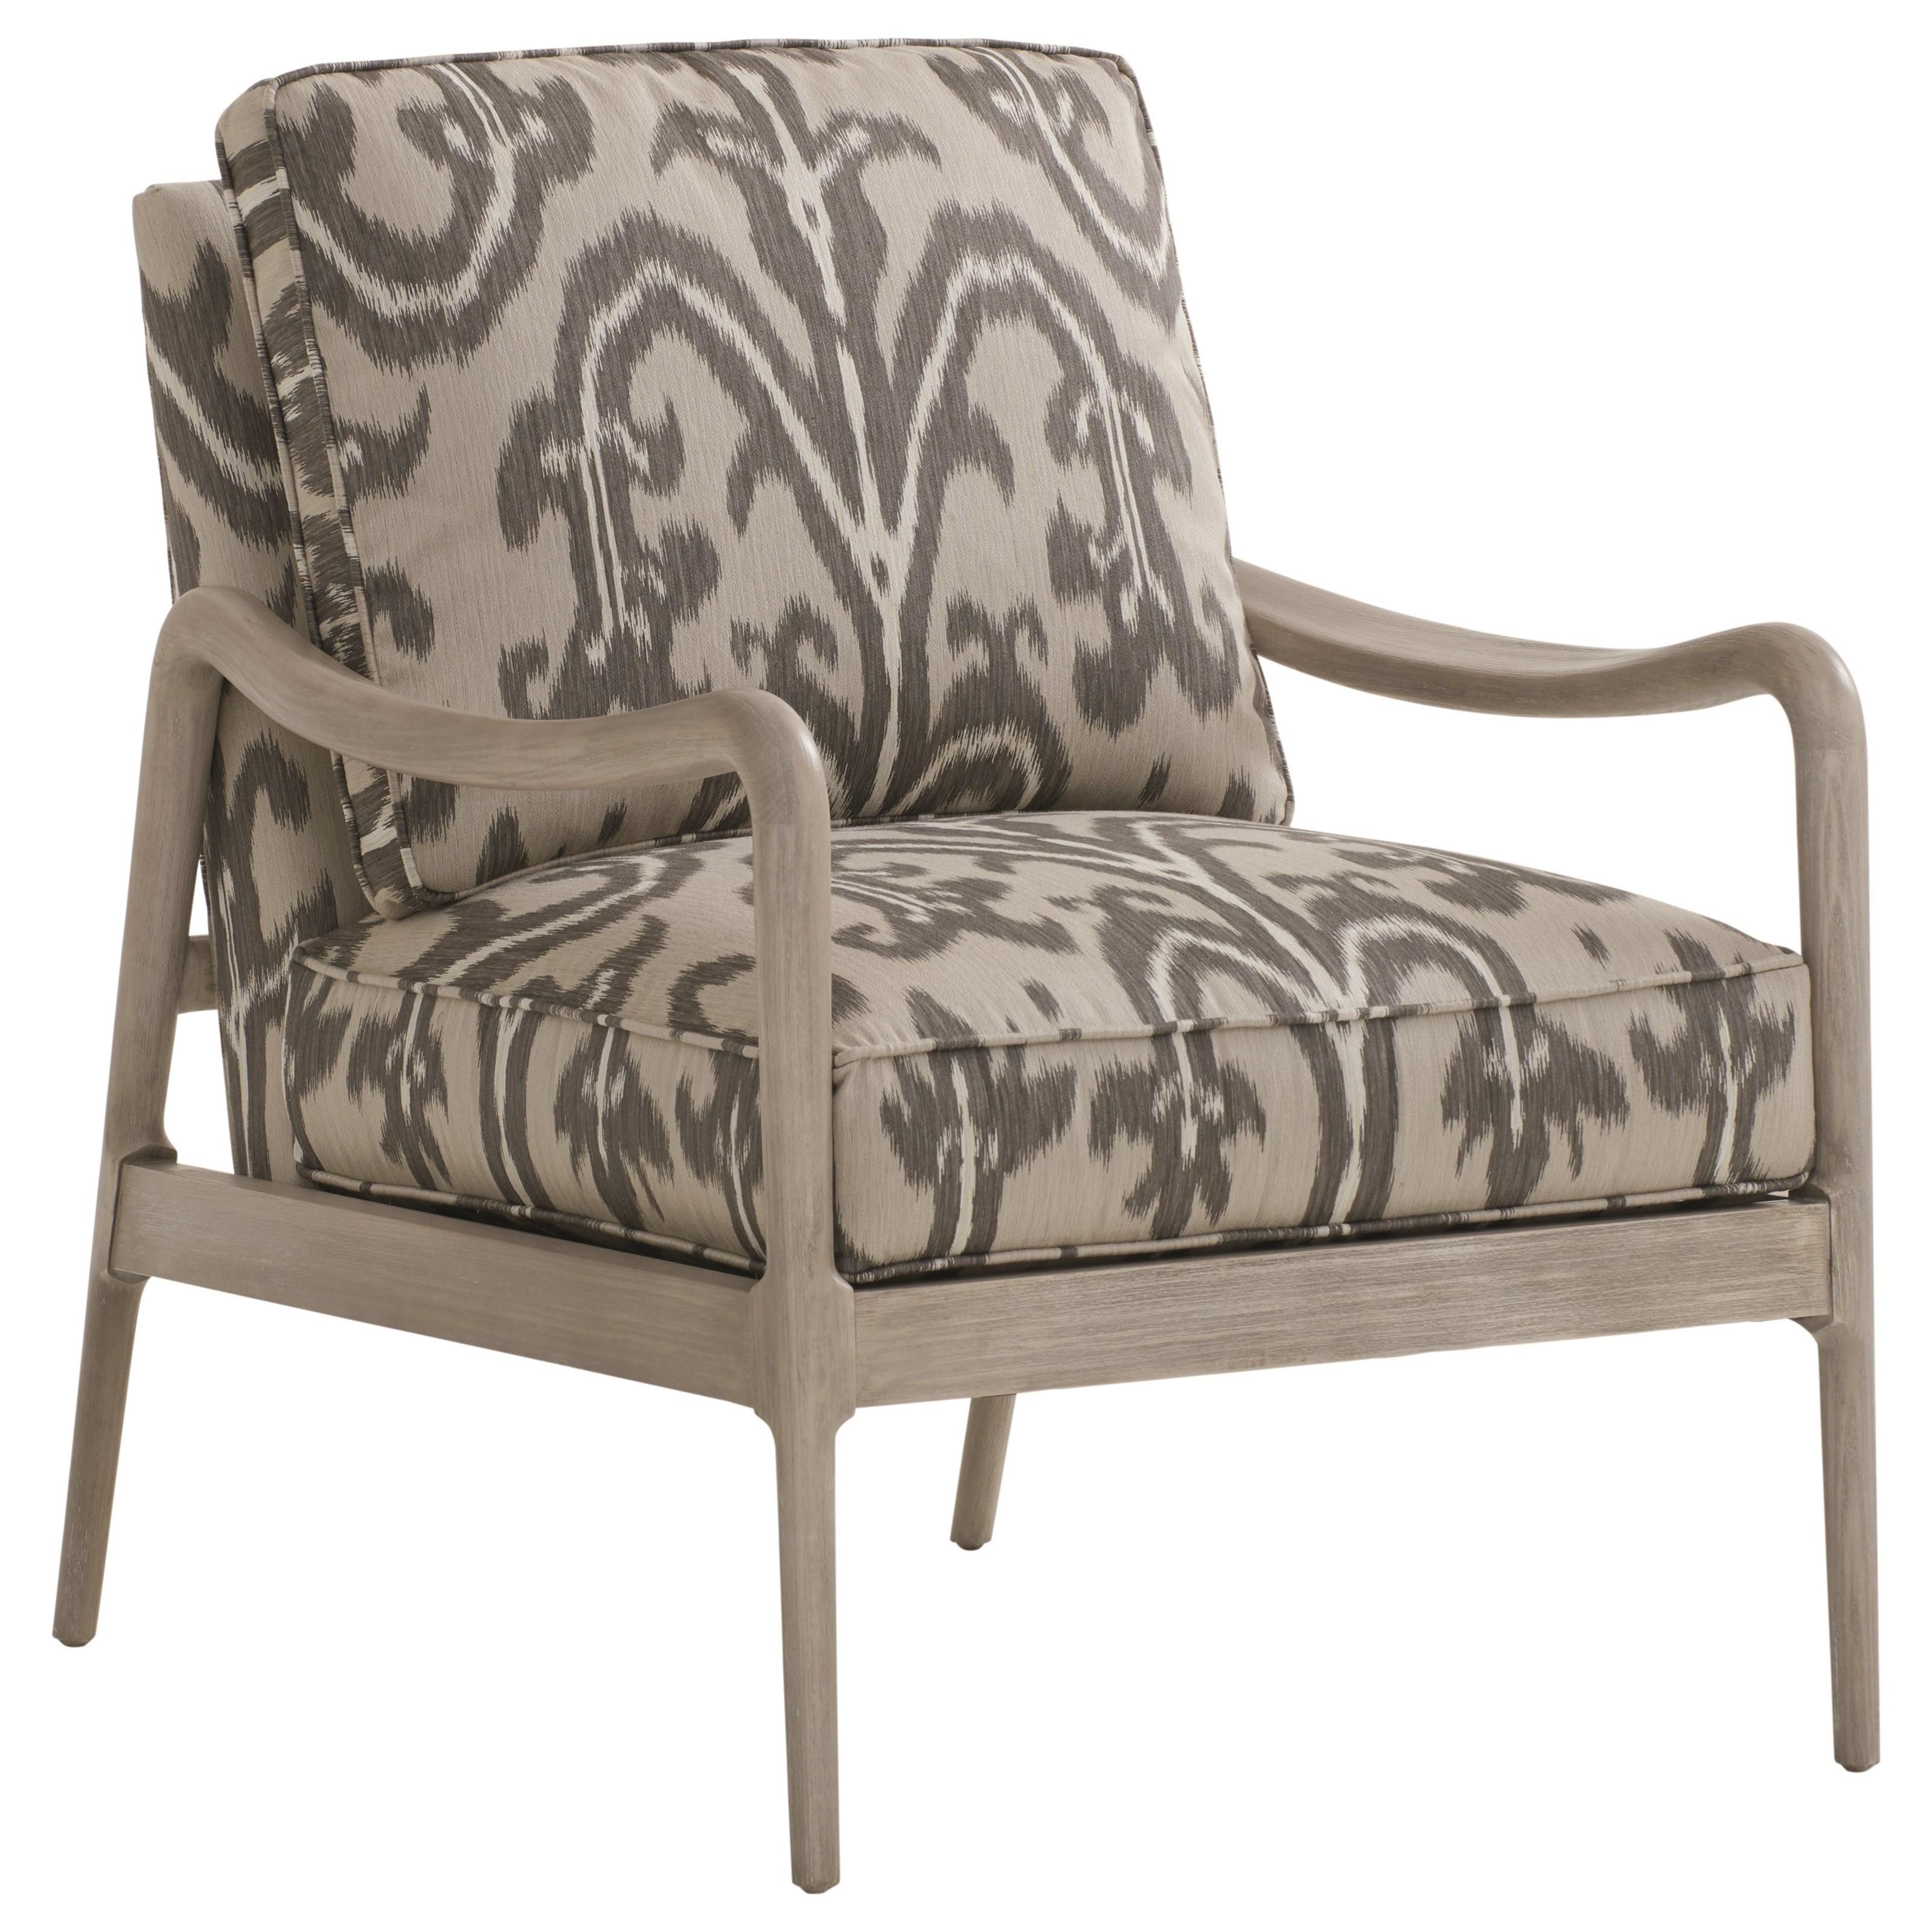 Barclay Butera Upholstery Leblanc Chair by Barclay Butera at Baer's Furniture